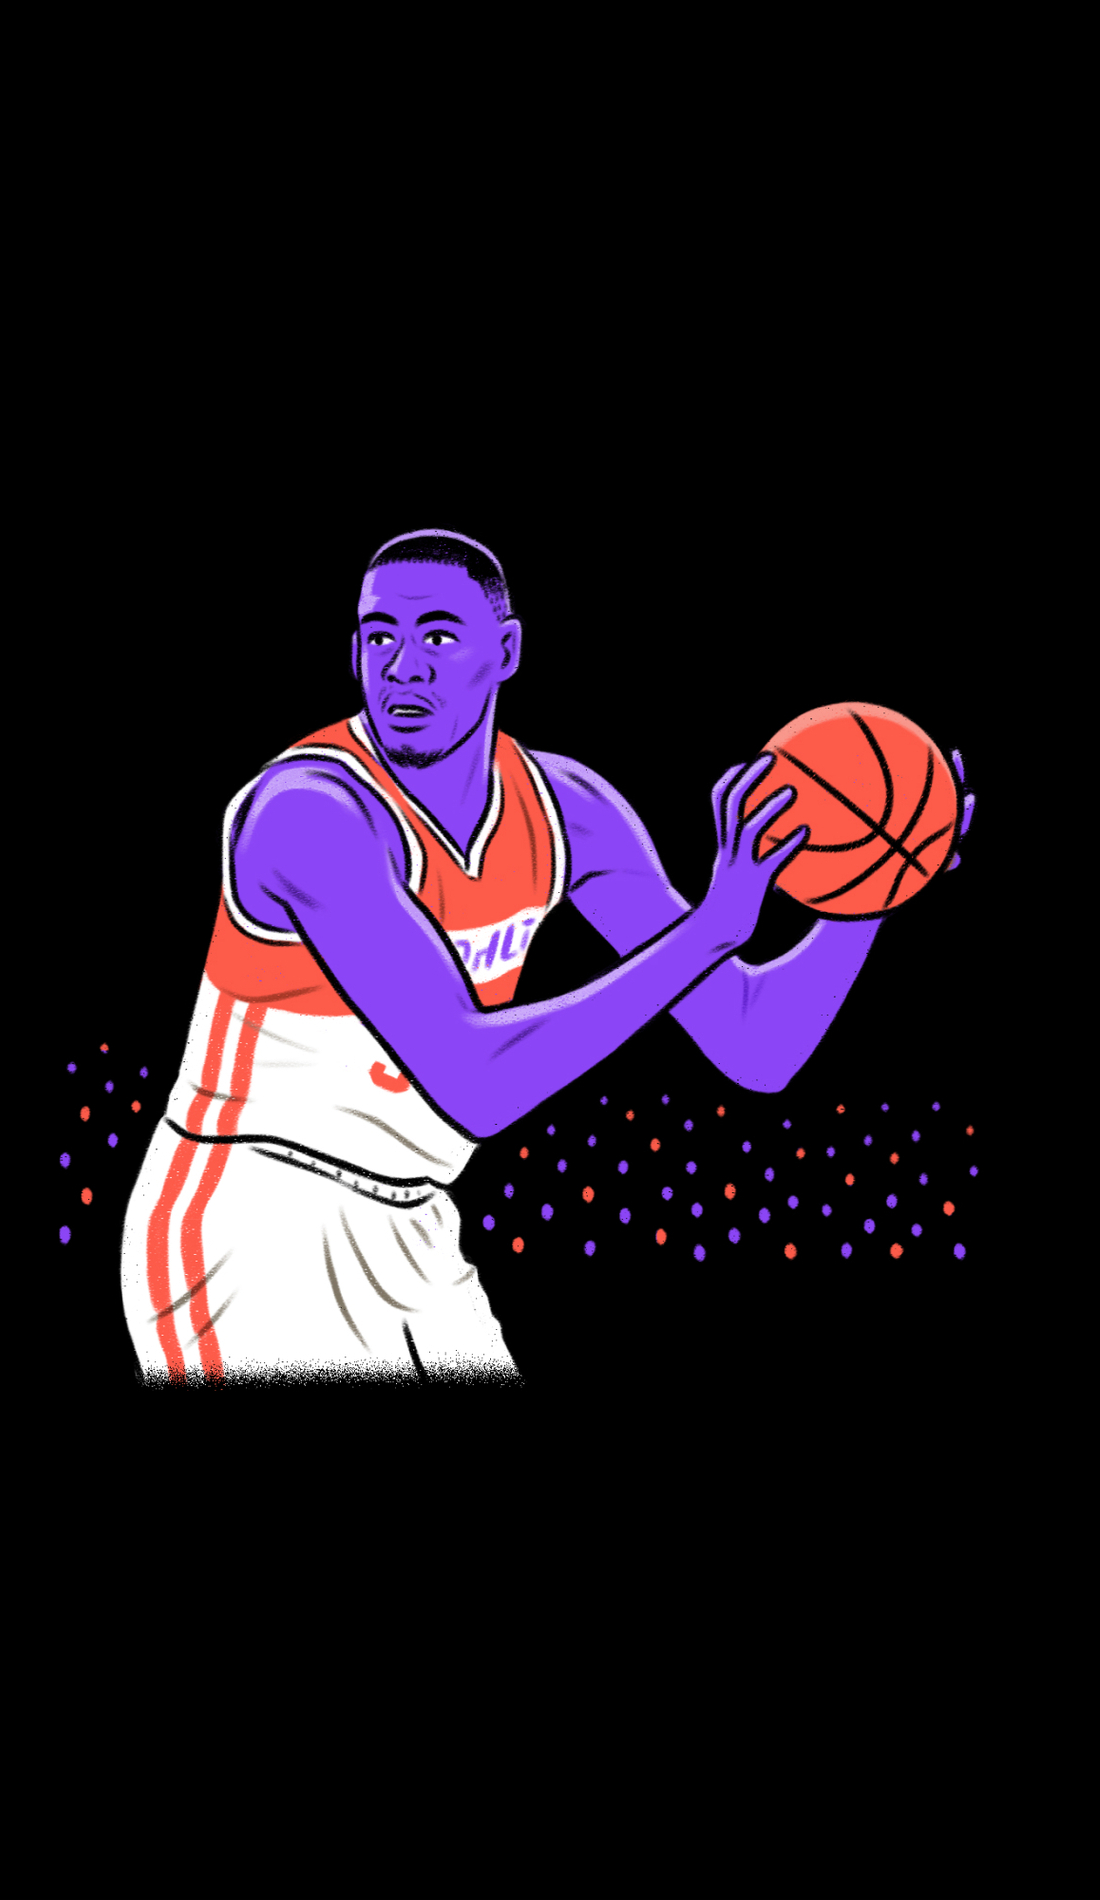 A George Washington Colonials Basketball live event